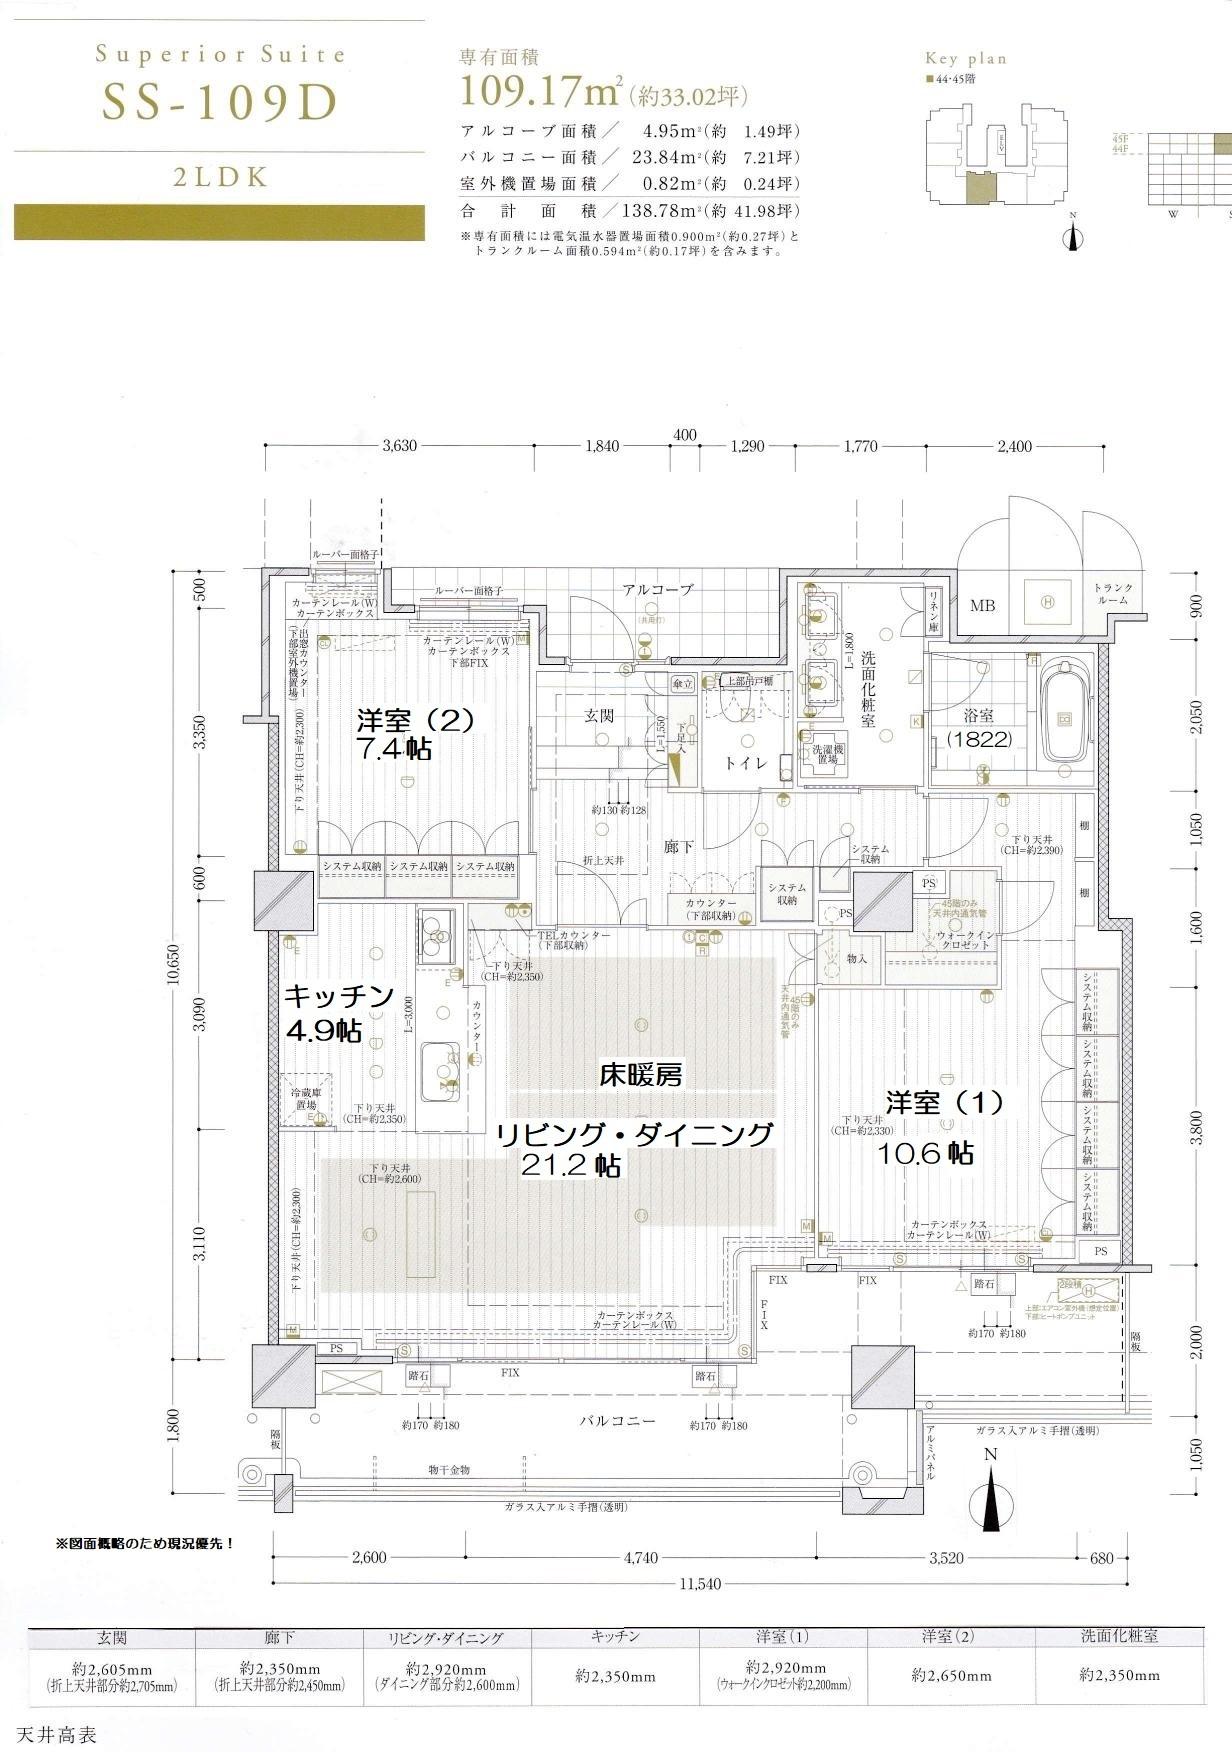 OSAKA福島タワー44階スーペリアスイート109.17㎡販売開始!_b0121630_13102317.jpg